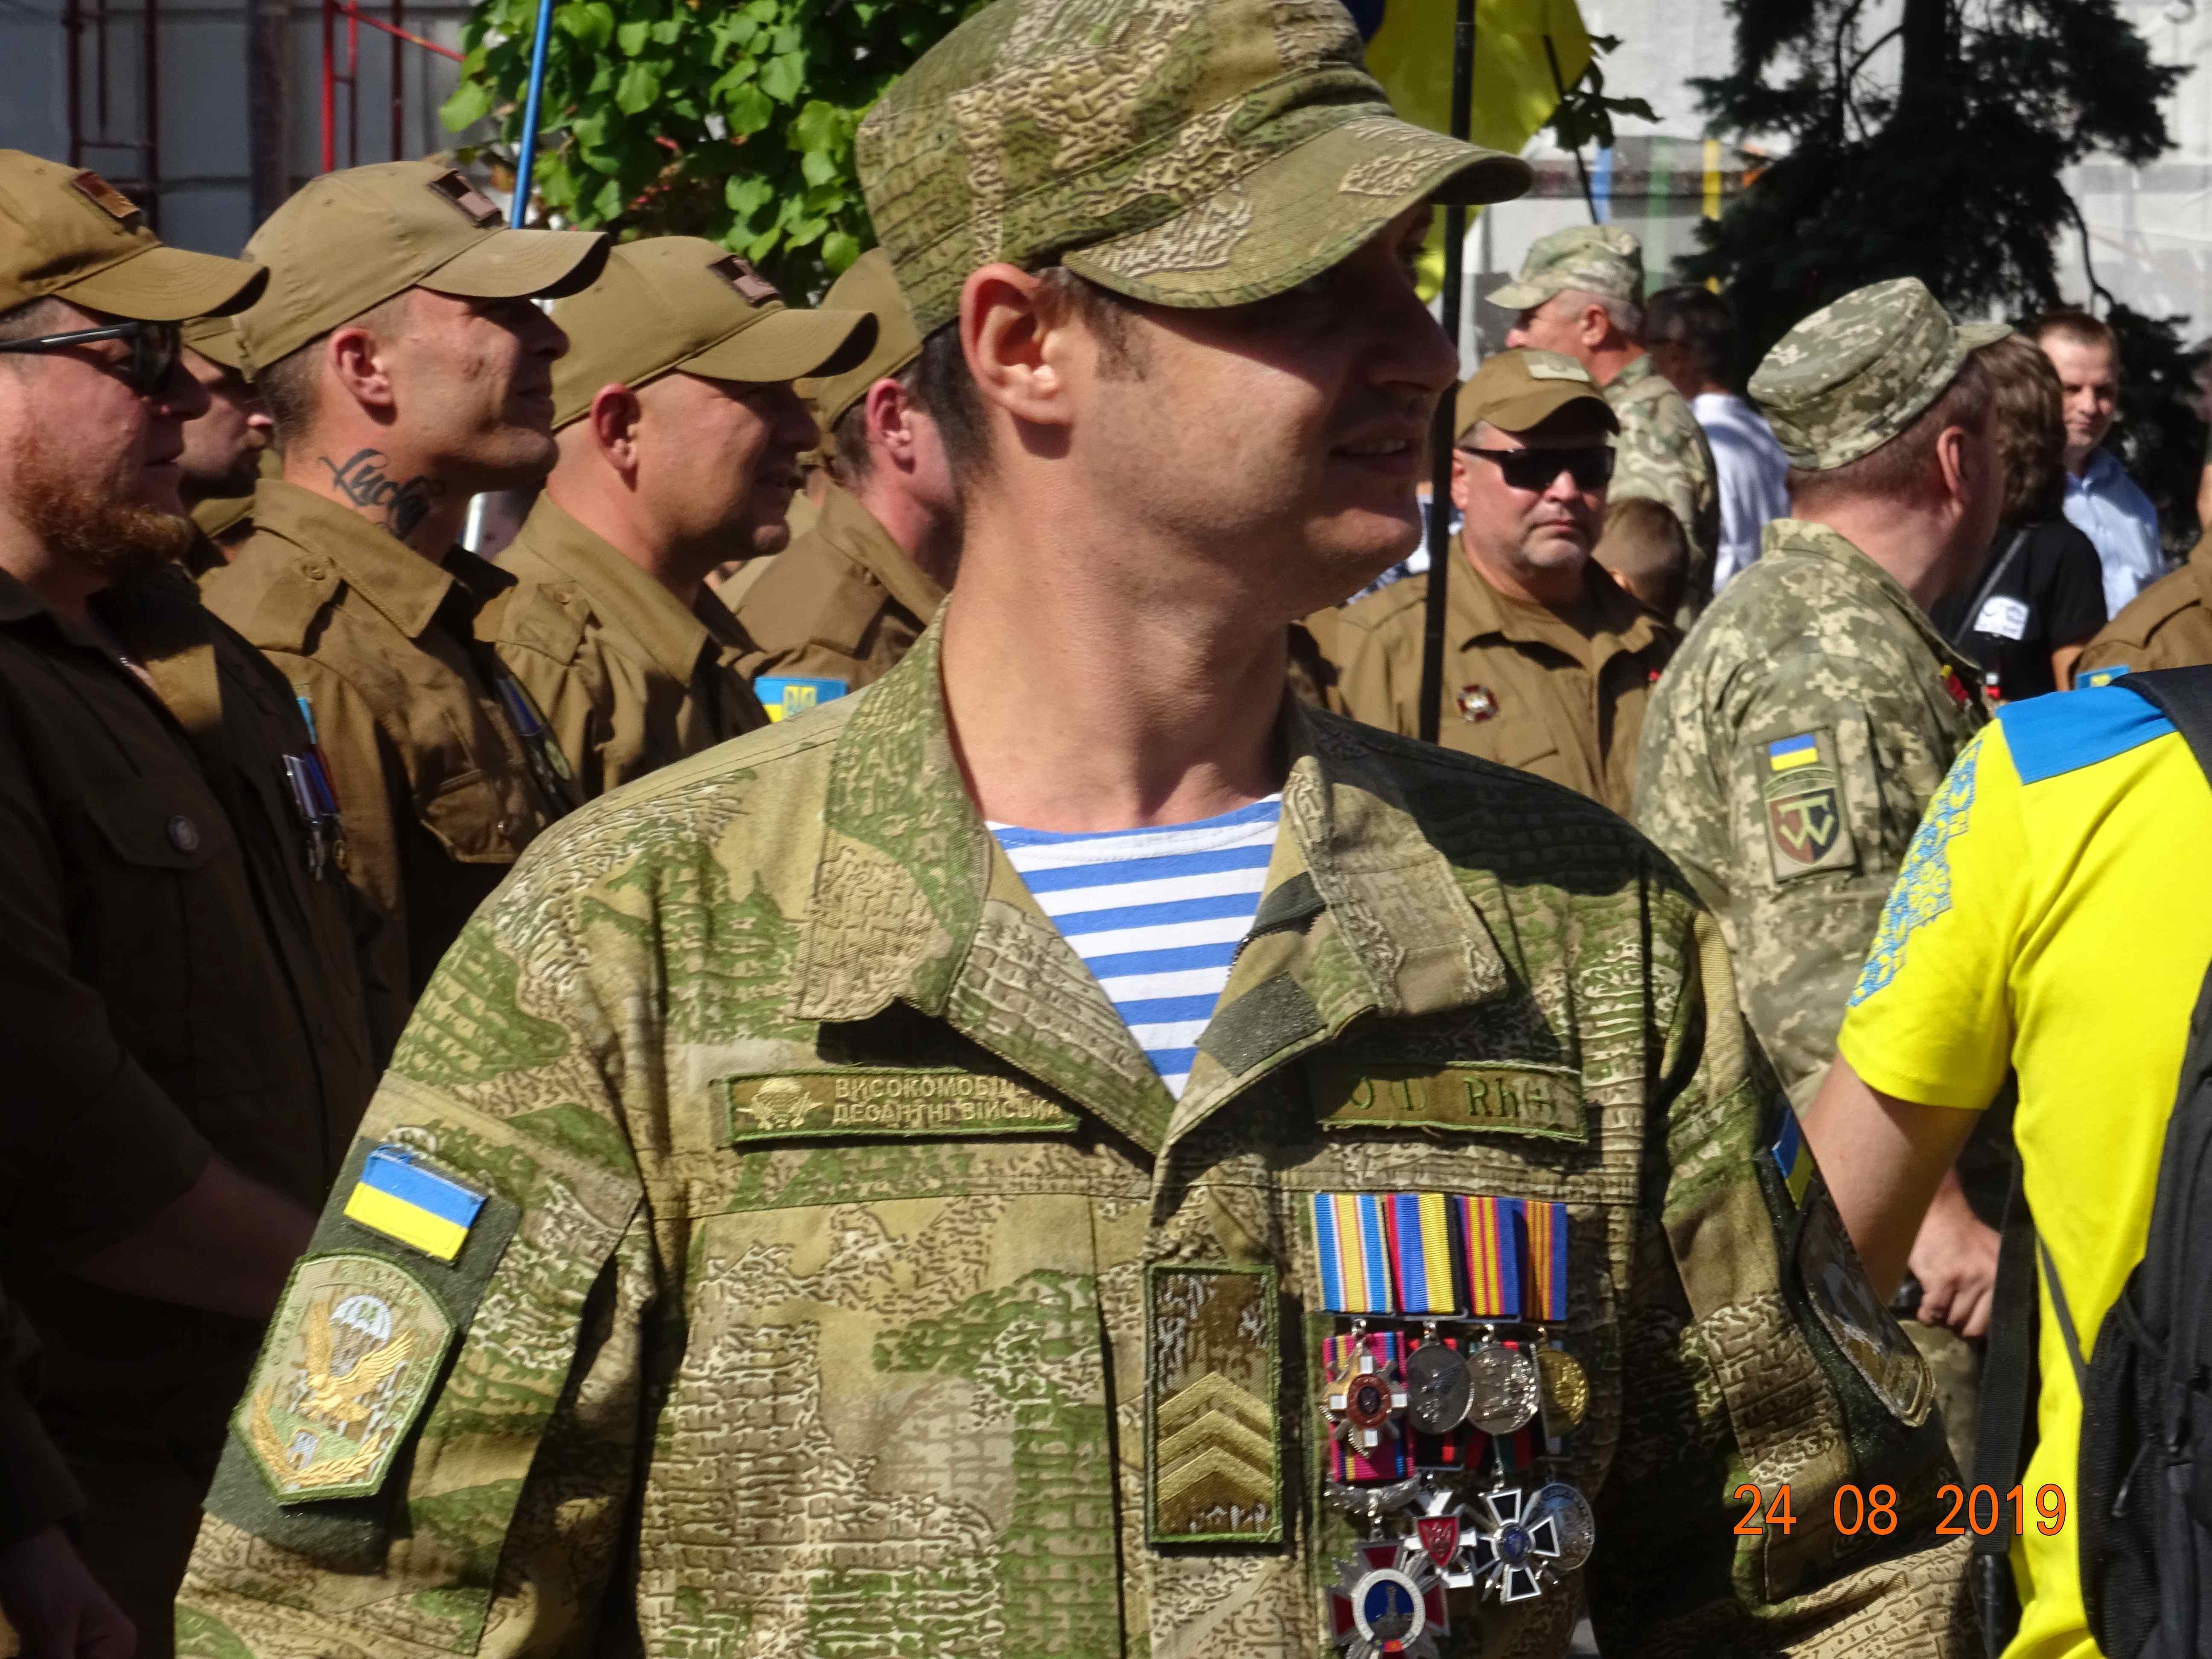 Defenders-of-Ukraine-Parad-24.Aug.19 - DSC05969.jpg